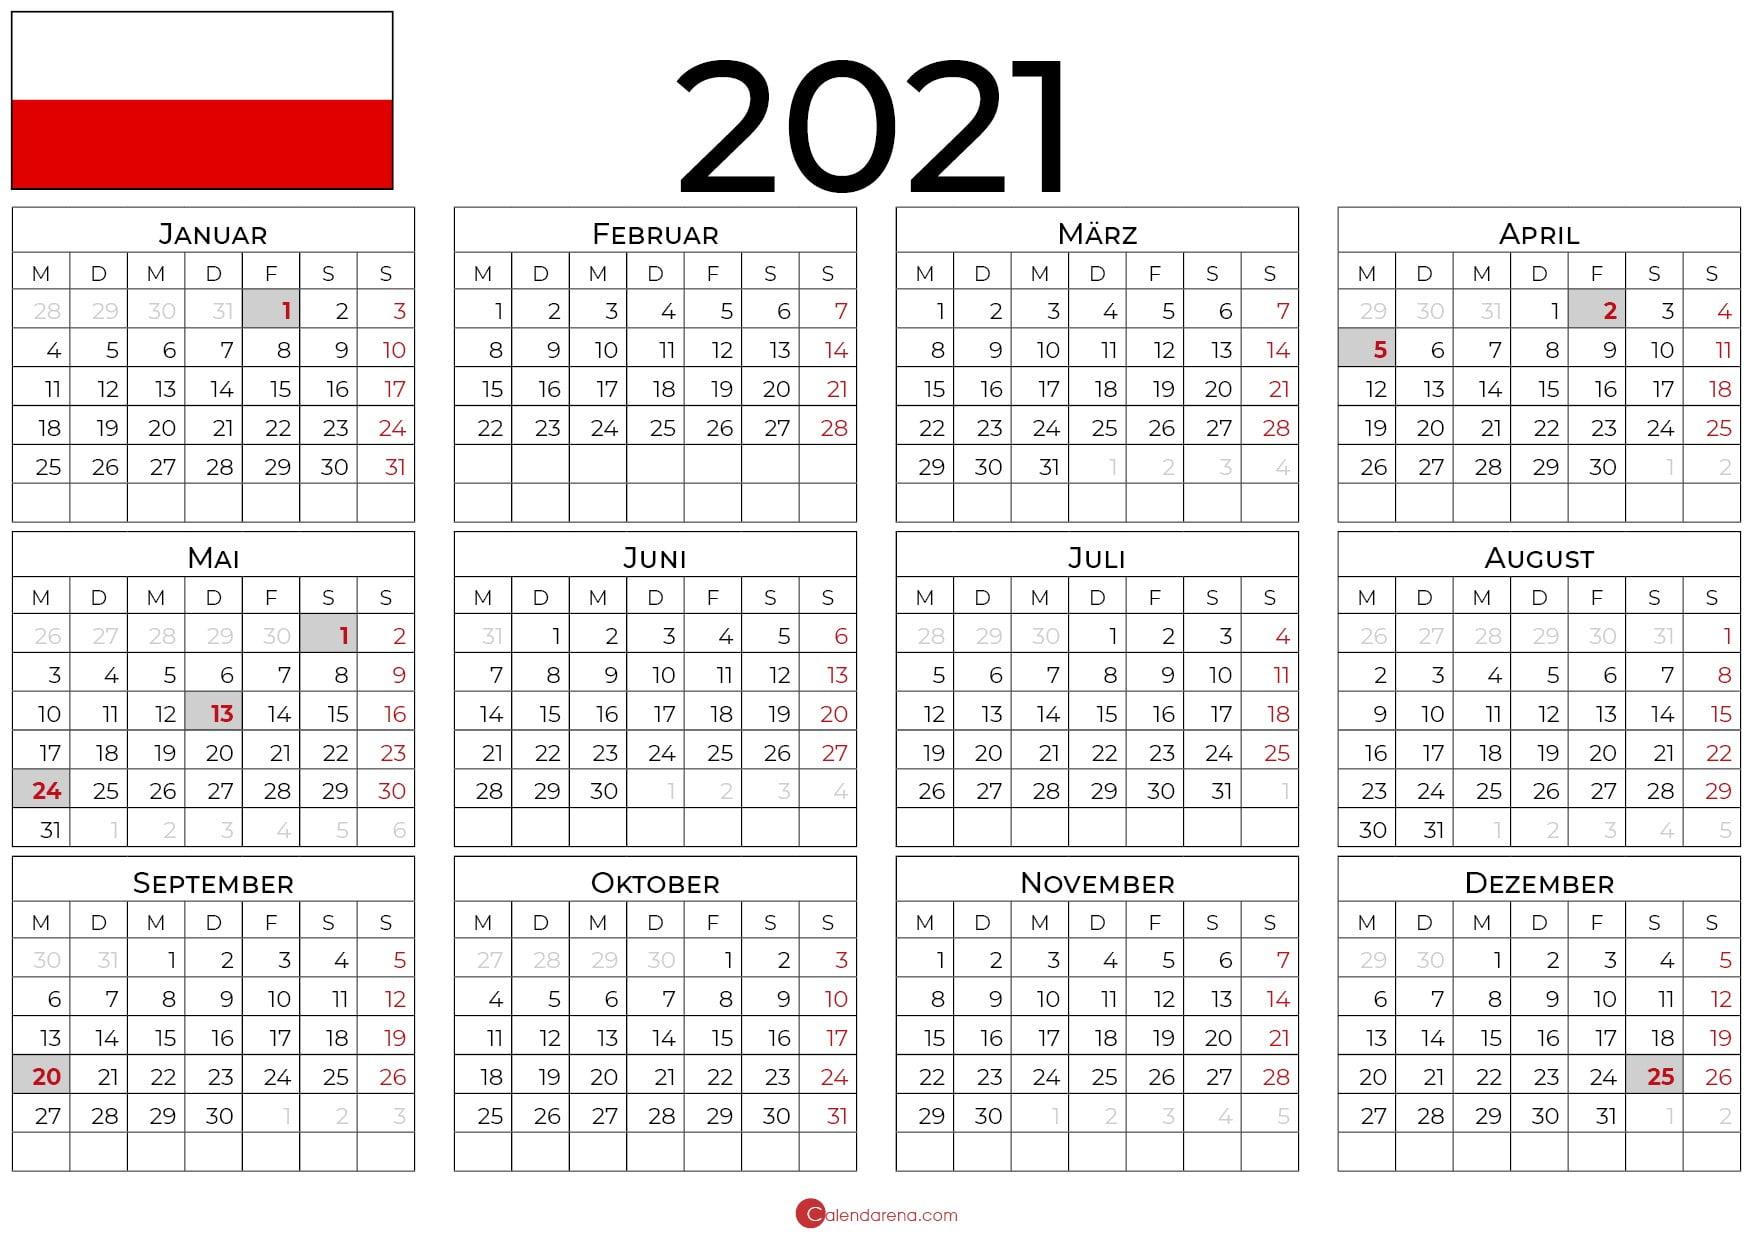 Kalenderwoche Aktuell